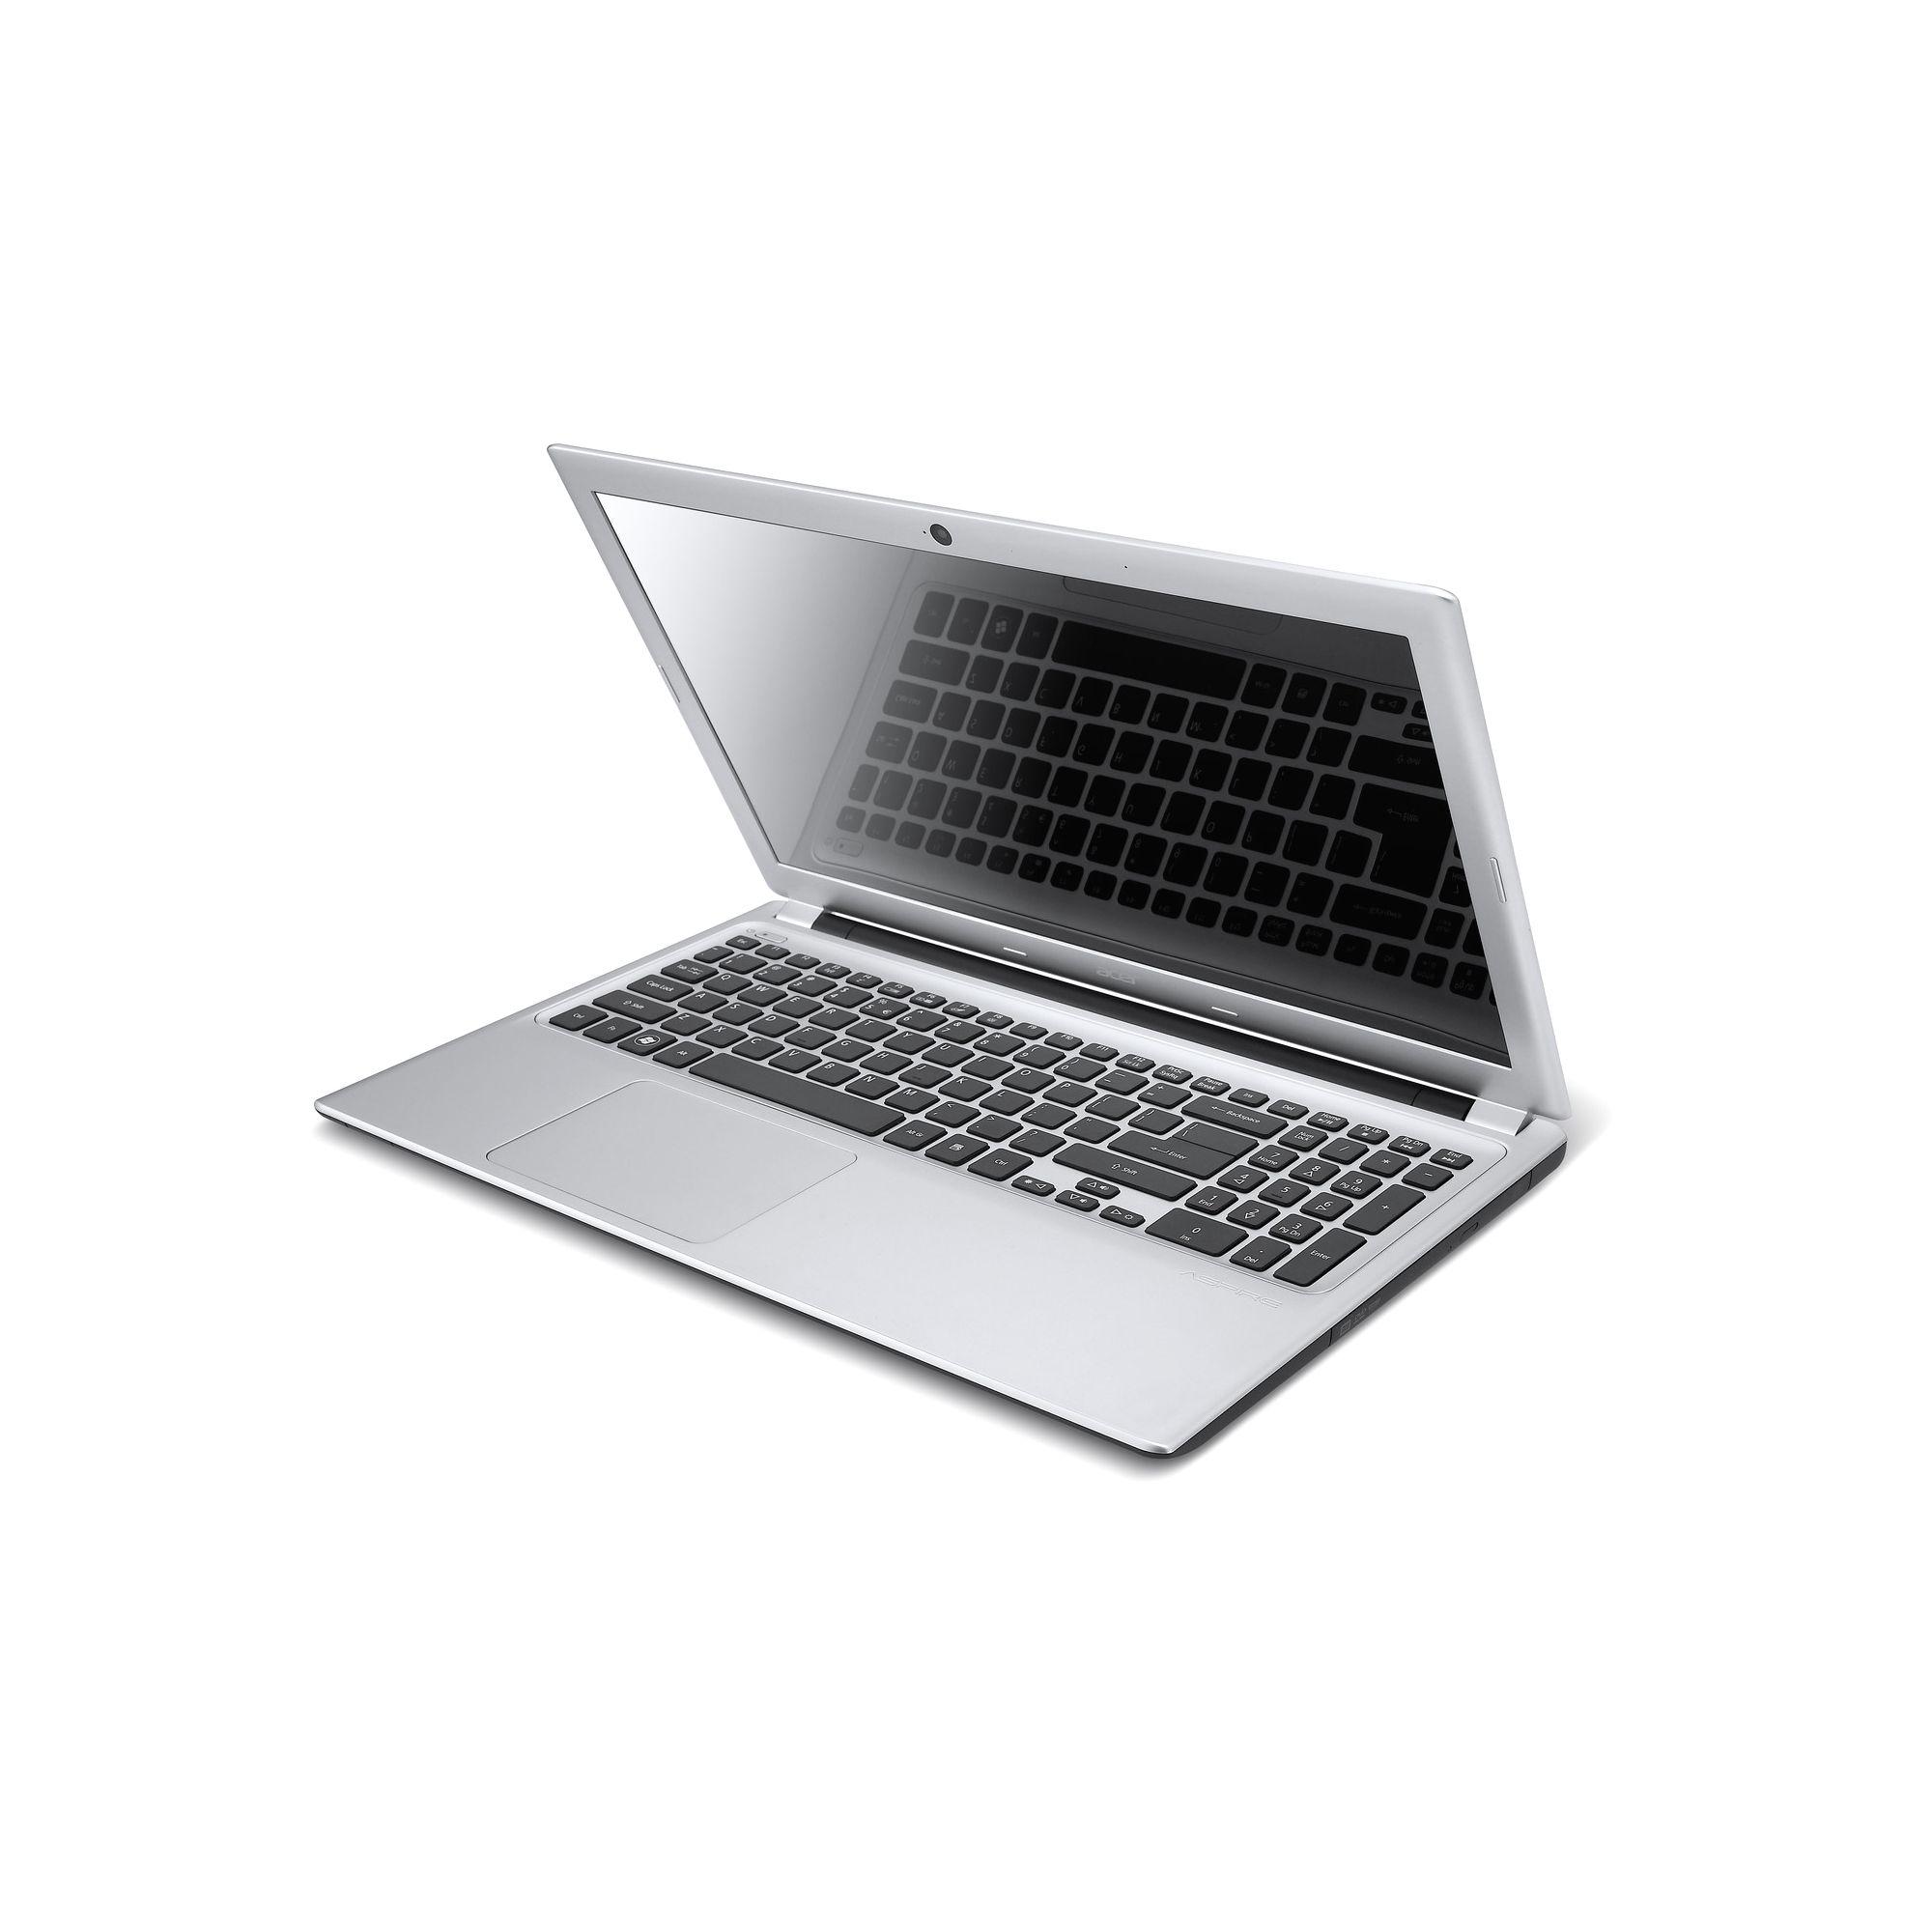 Acer Aspire V5-571 (15.6 inch) Notebook Core i3 (2365M) 1.4GHz 4GB 500GB DVD-SM DL WLAN BT Webcam Windows 8 64-bit Intel HD Graphics 3000 (Matte at Tesco Direct